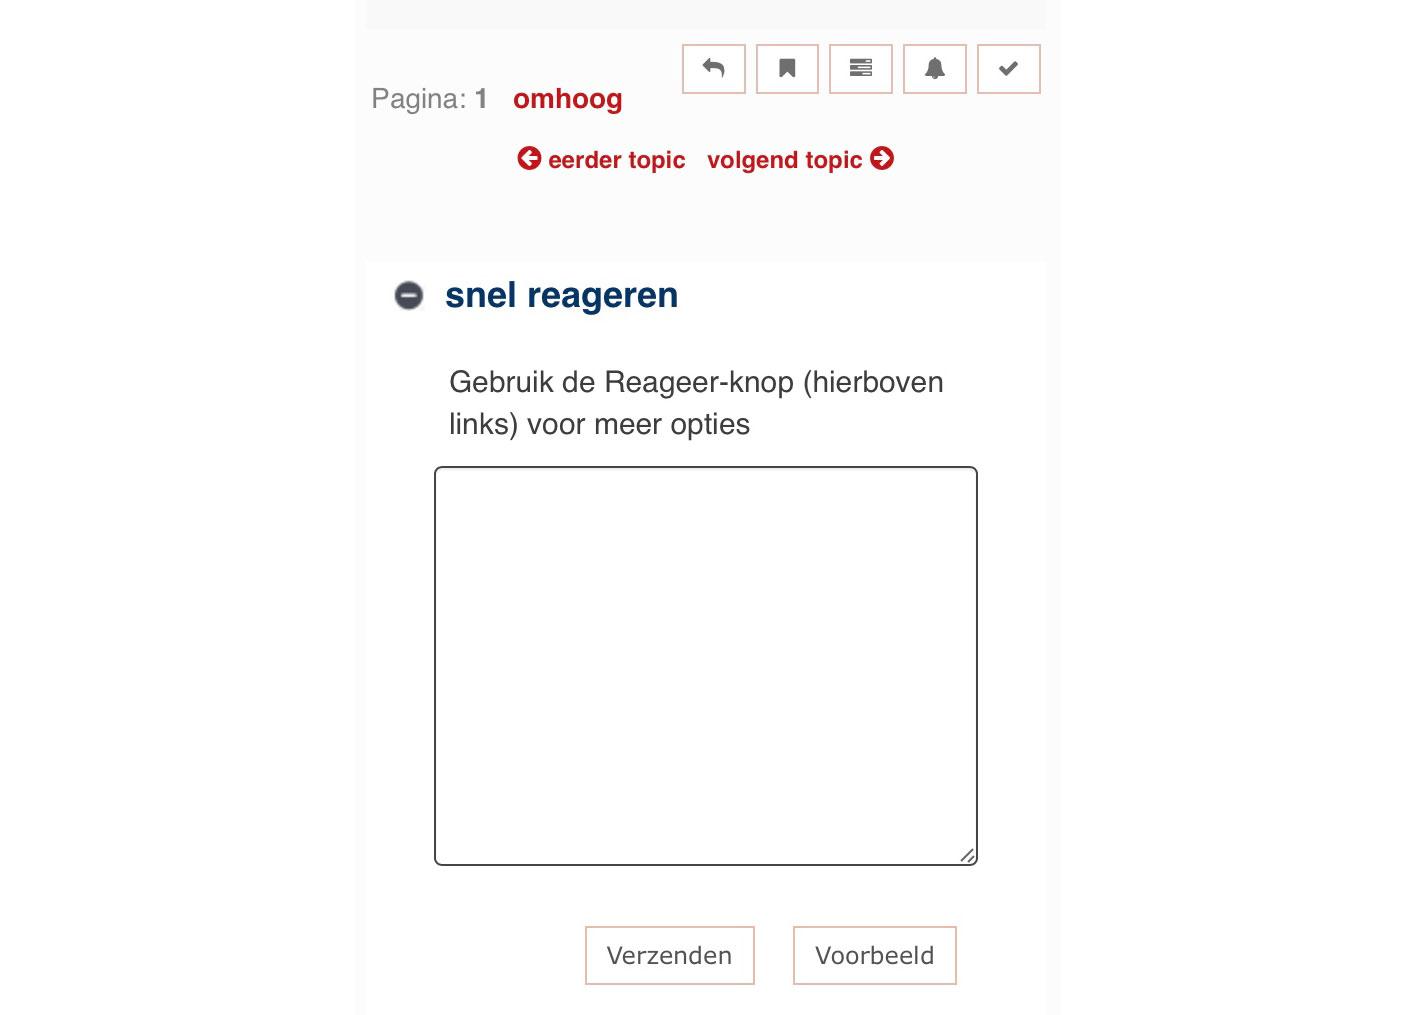 https://www.macfreak.nl/modules/news/images/zArt.UitlegBijlagesPlaatsenMacFreak-2.jpg